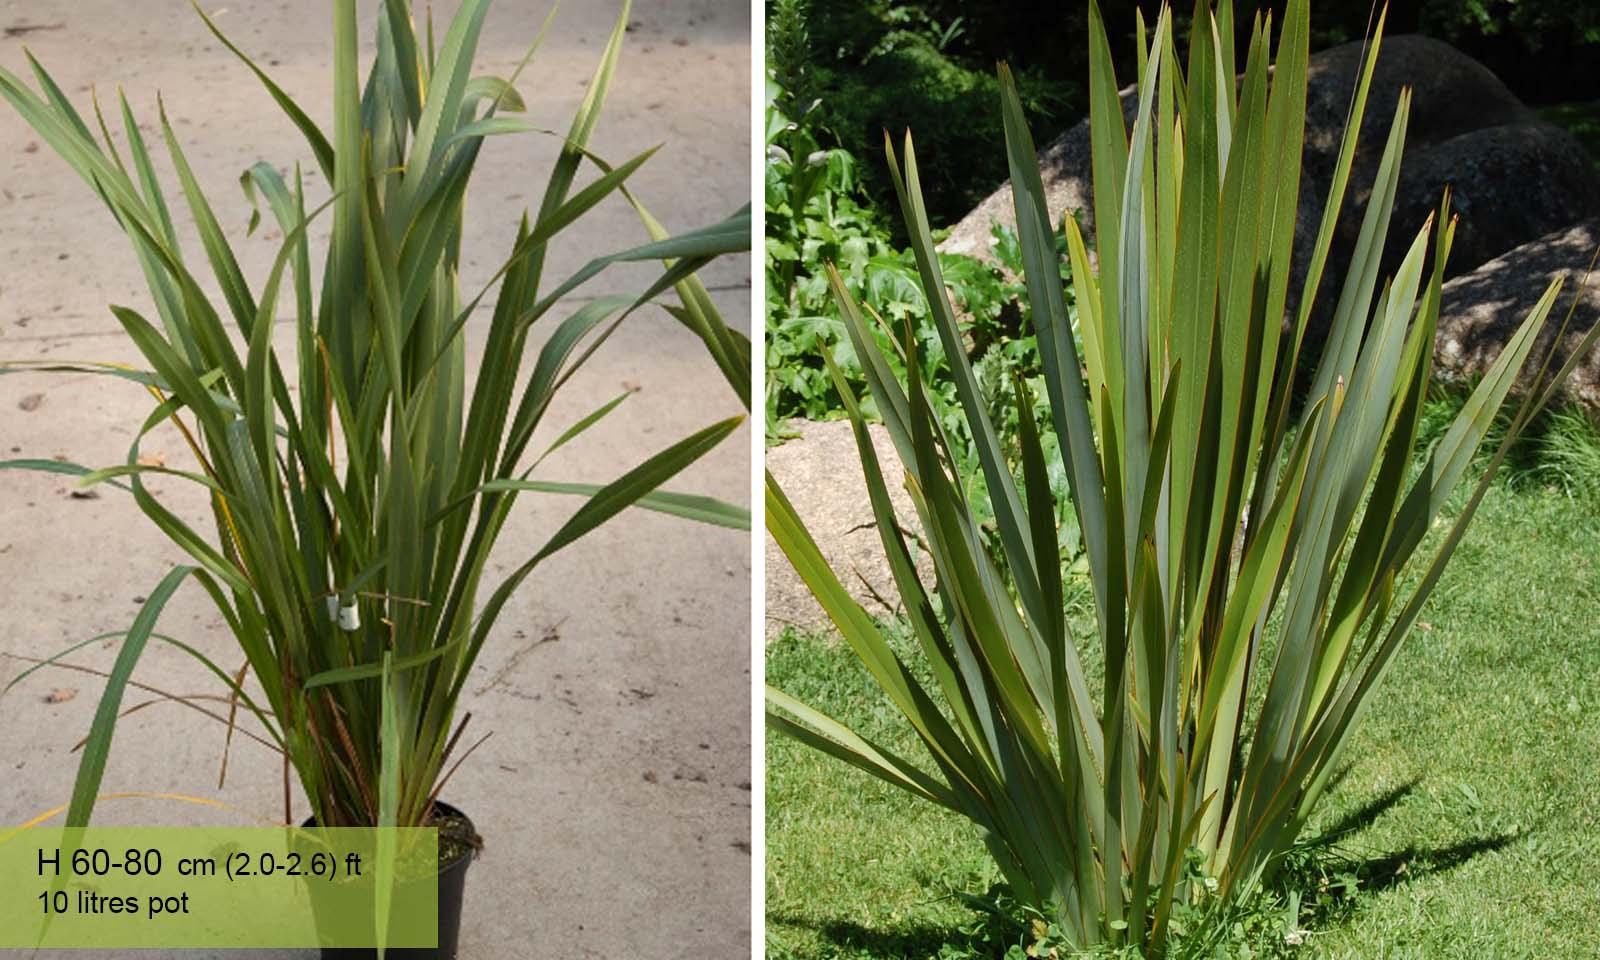 Phormium Tenax (New Zealand Flax)